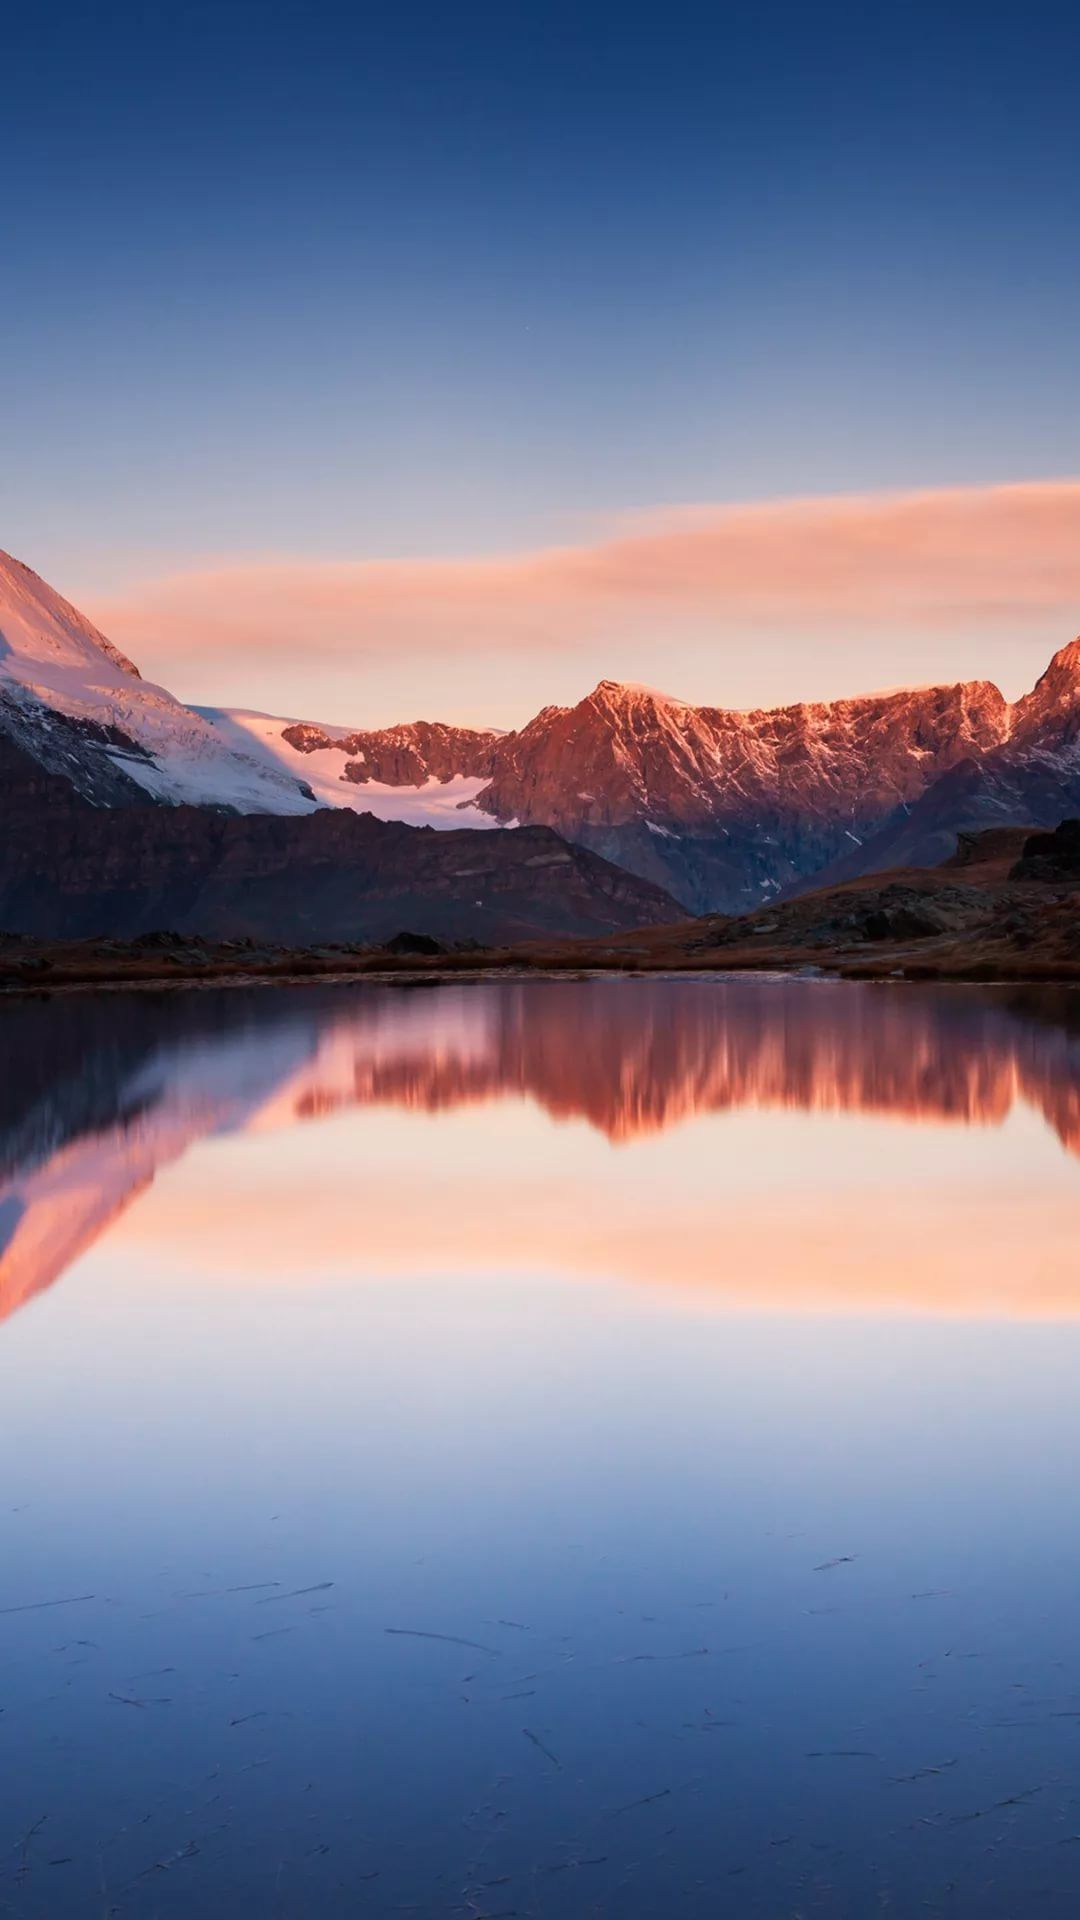 Mountain Wallpaper iPhone 5